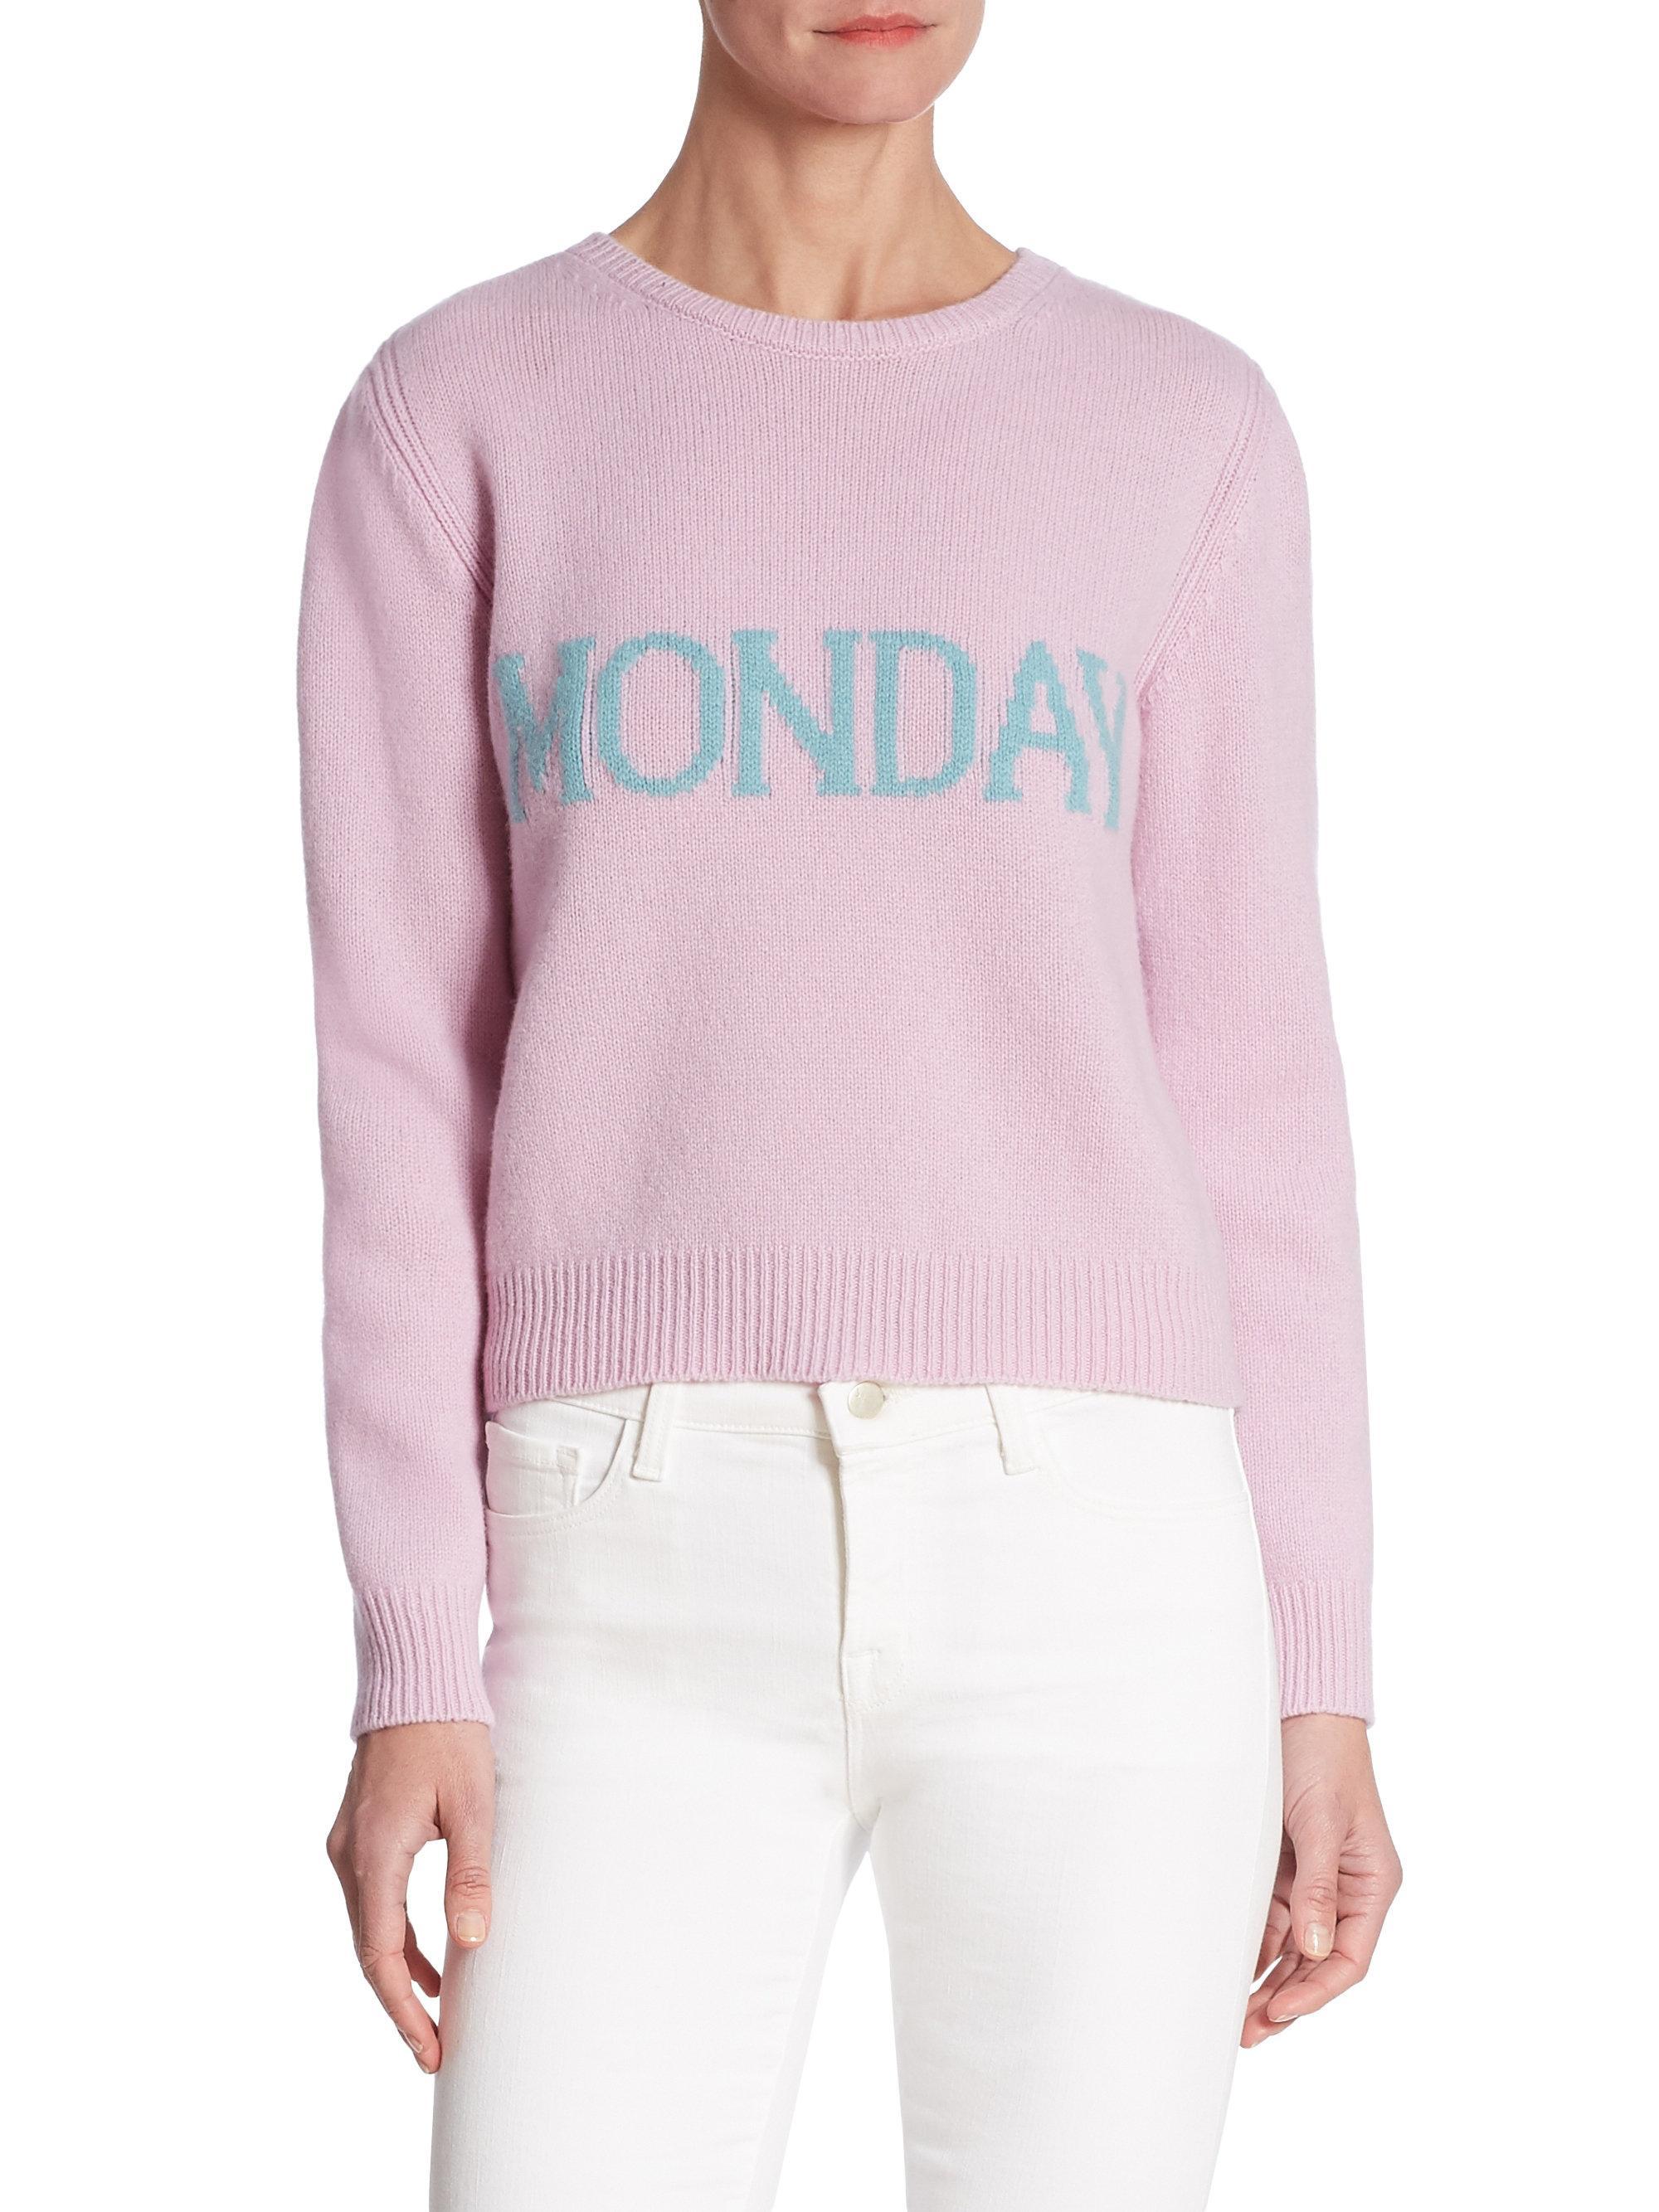 Alberta Ferretti Monday sweater dress Wear Resistance LVPz0a